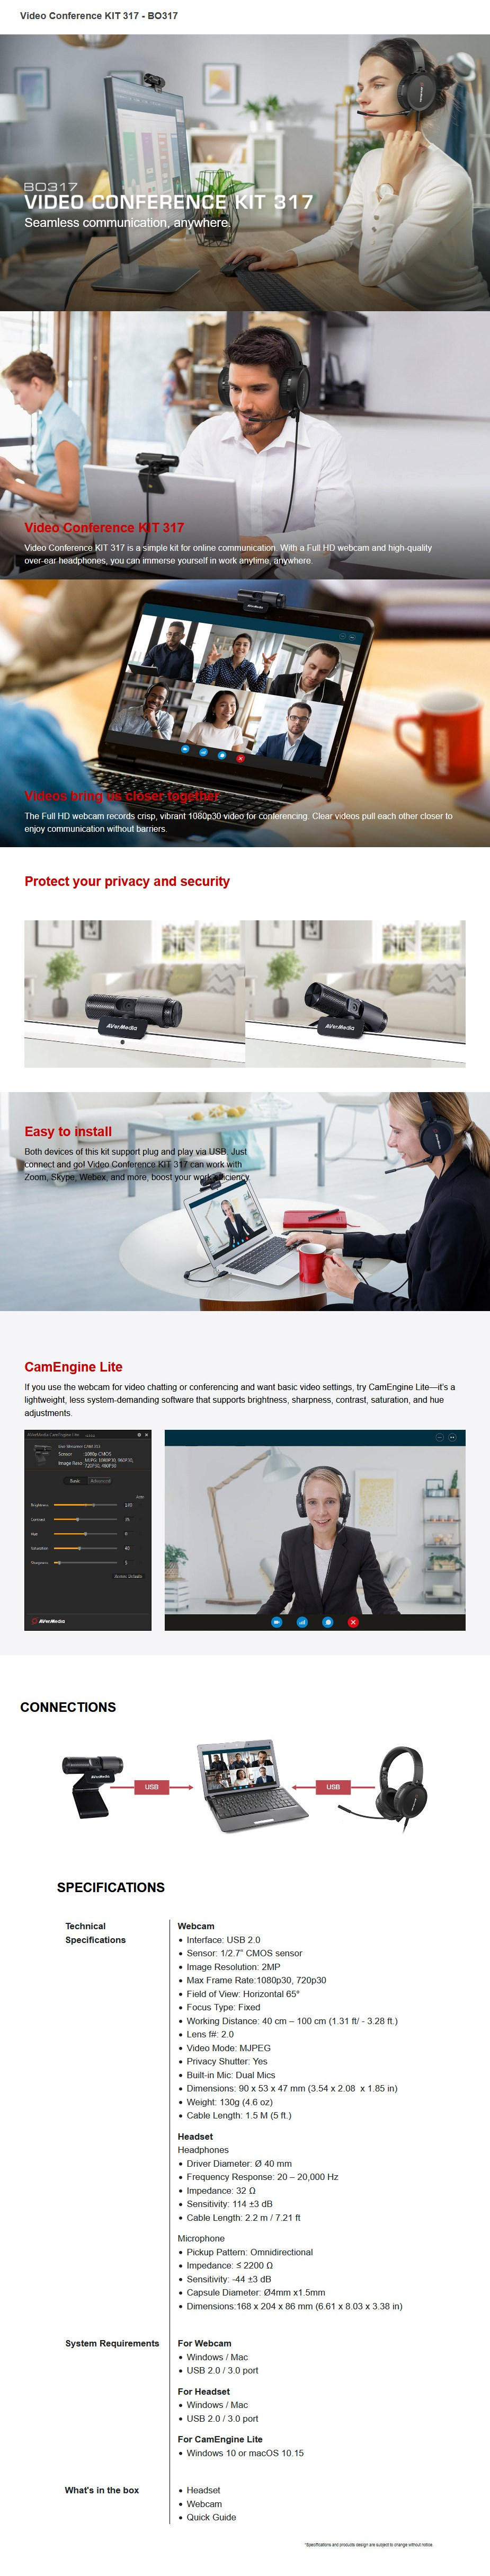 Avermedia BO317 Video Conferencing Kit - Full HD Webcam & Over-Ear Headphones - Overview 1